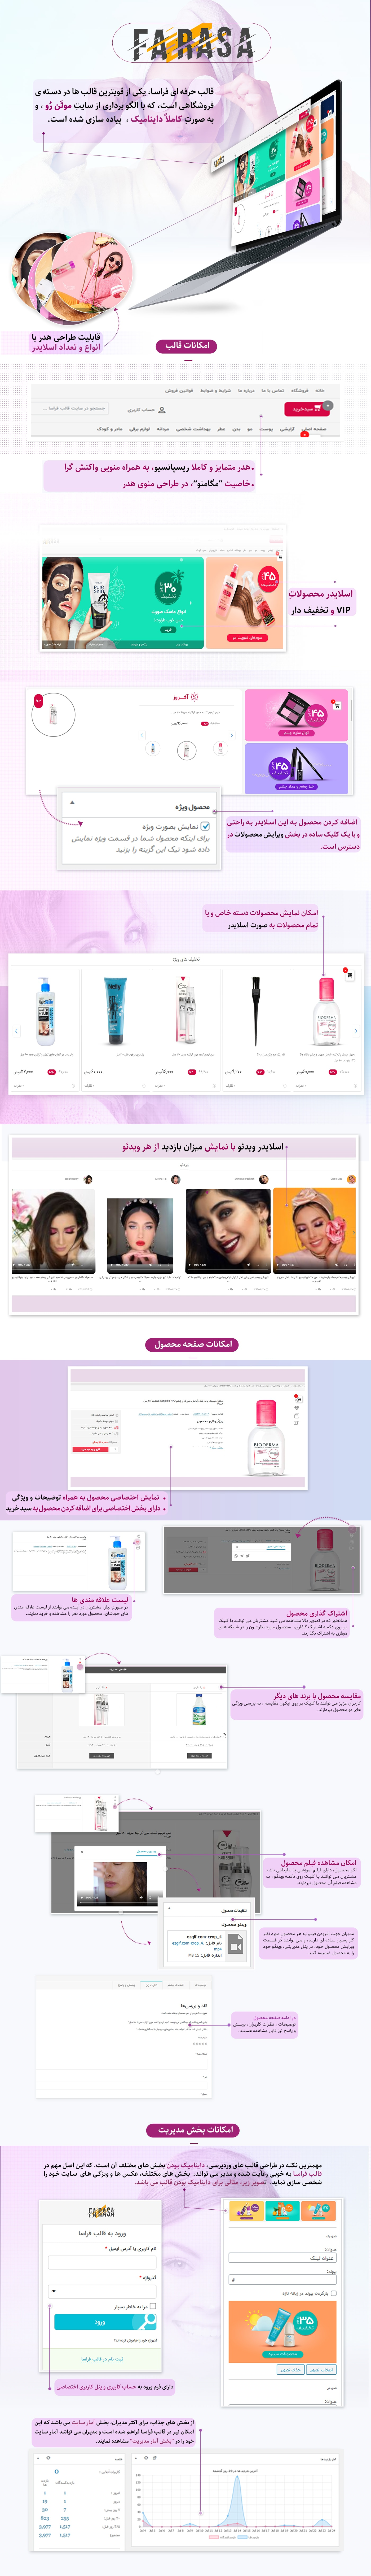 90025 7493bcb2563923056da632cf6 - قالب فراسا، پوسته فروشگاهی ایرانی farasa